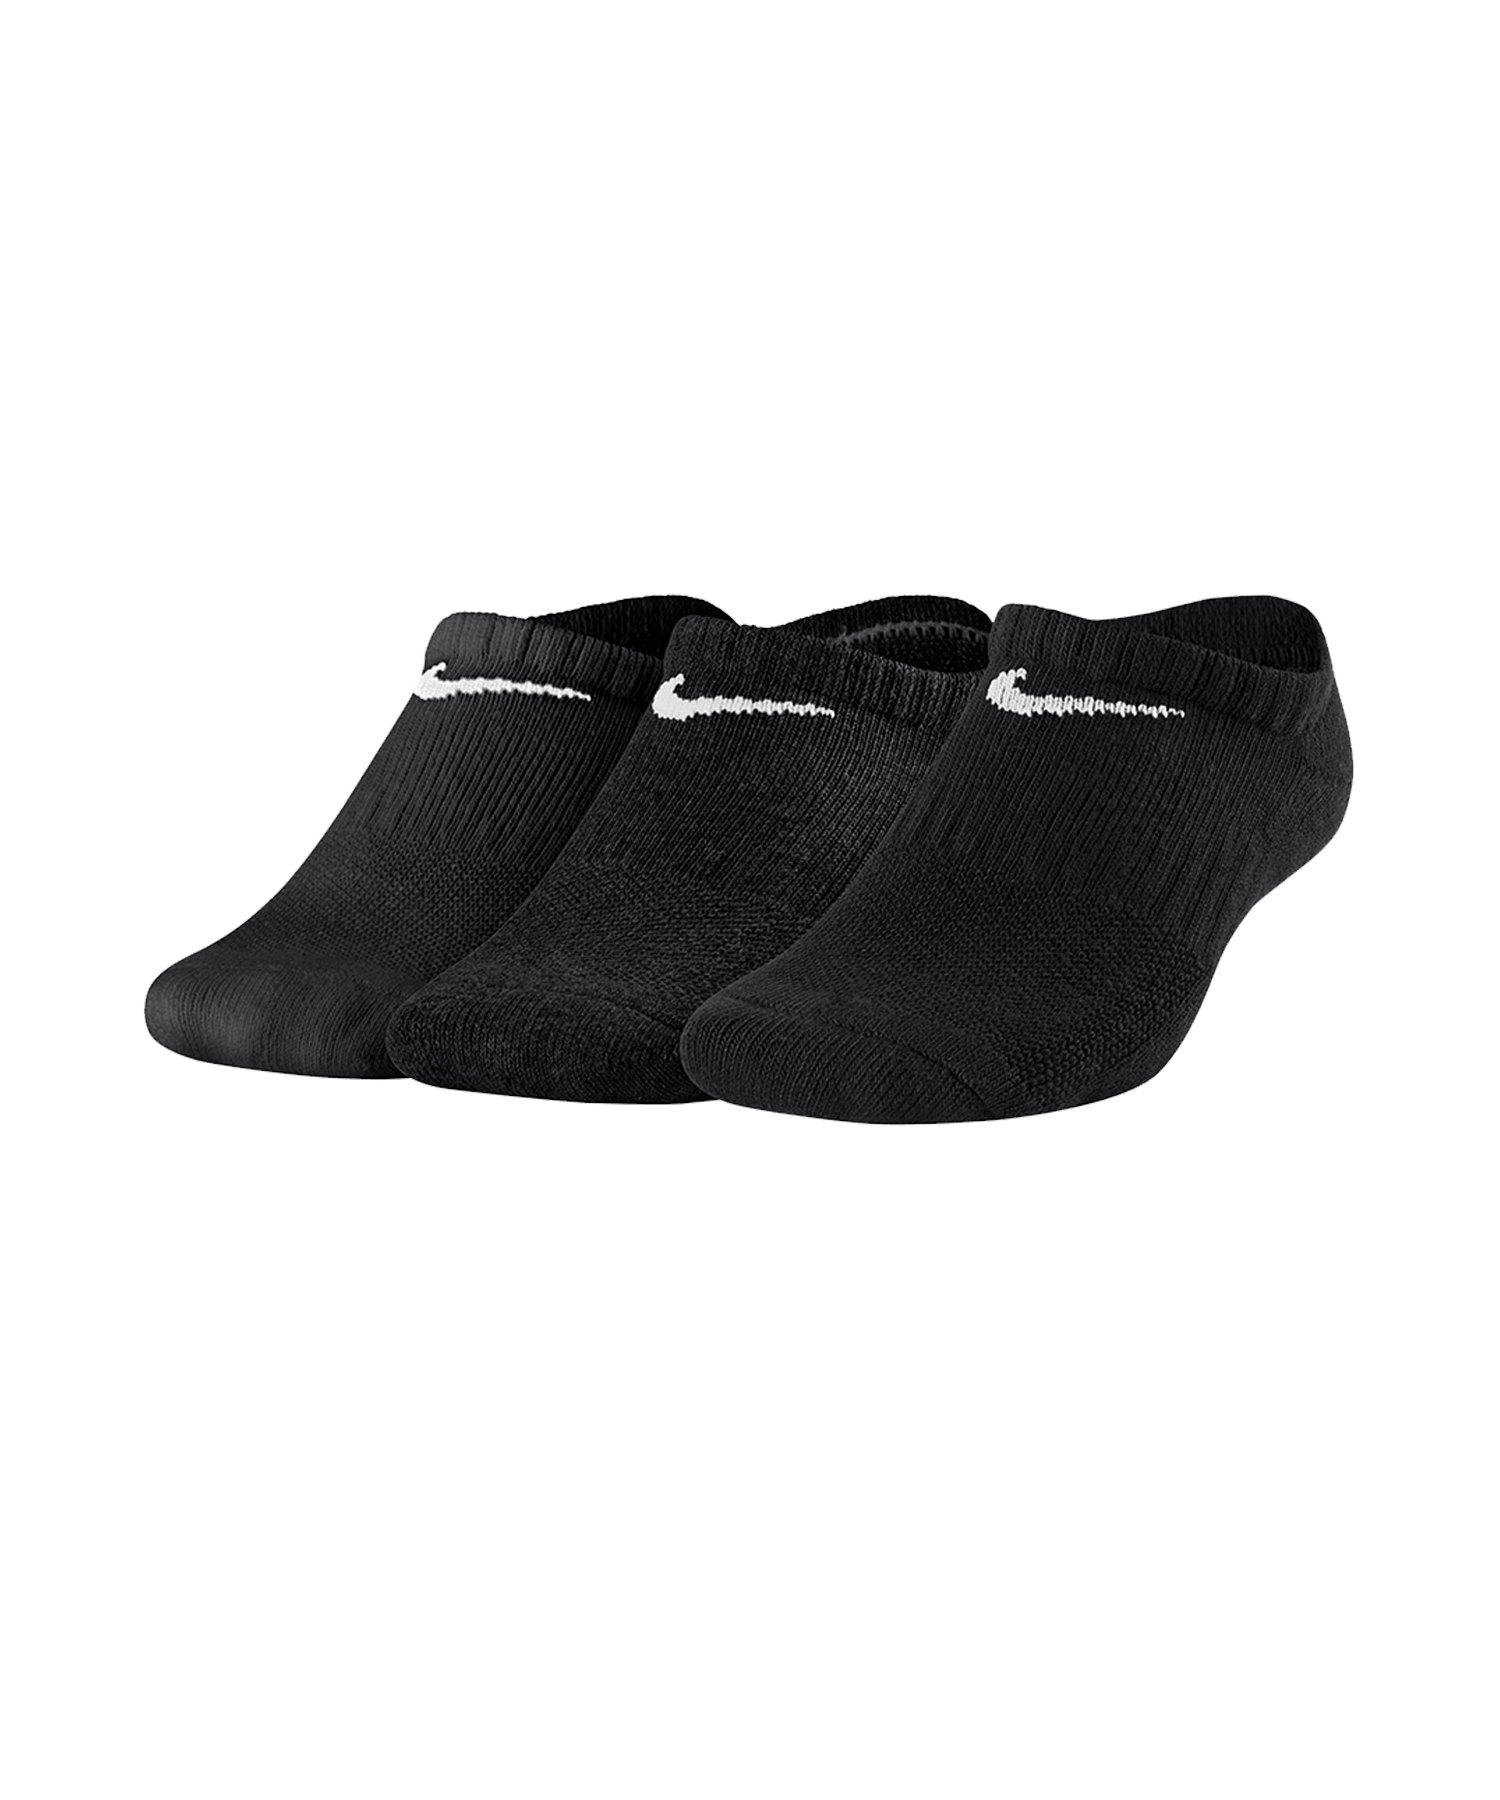 Nike Cushioned No Show Socken 3er Pack Kids F010 - schwarz